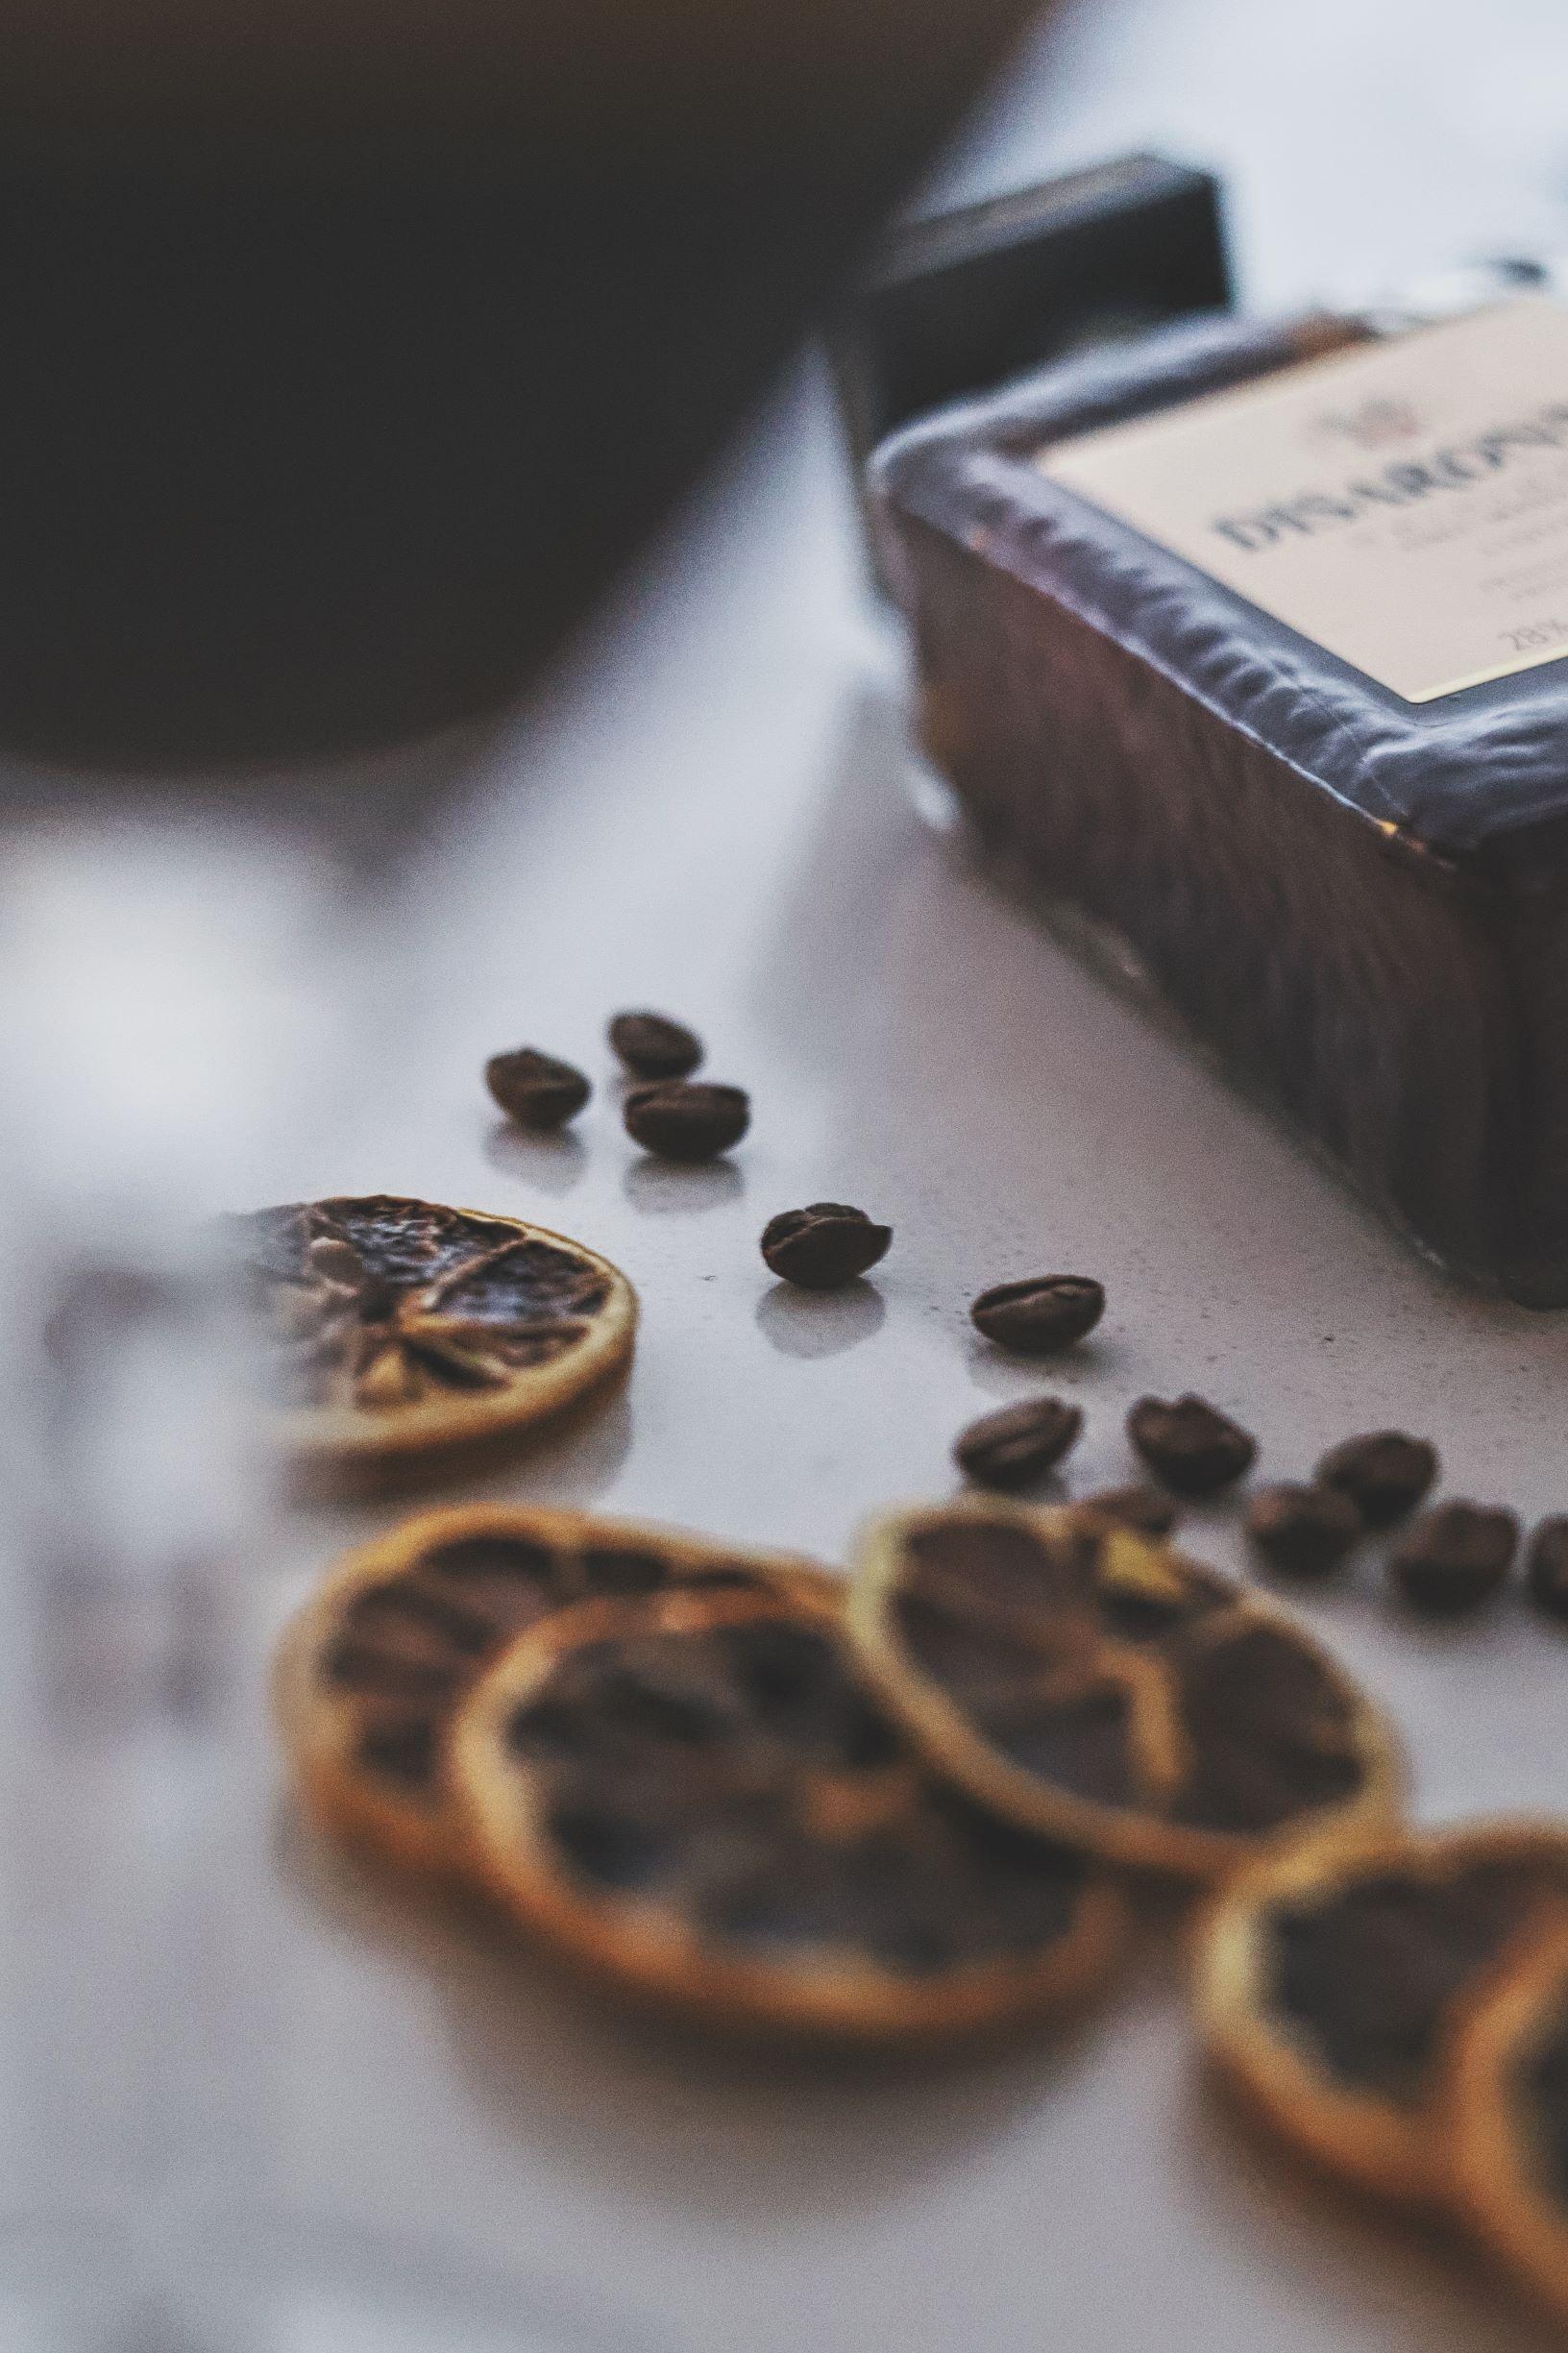 LeClair organics best saskatoon coffees and saskatoon coffee roaster, espresso martini with amaretto